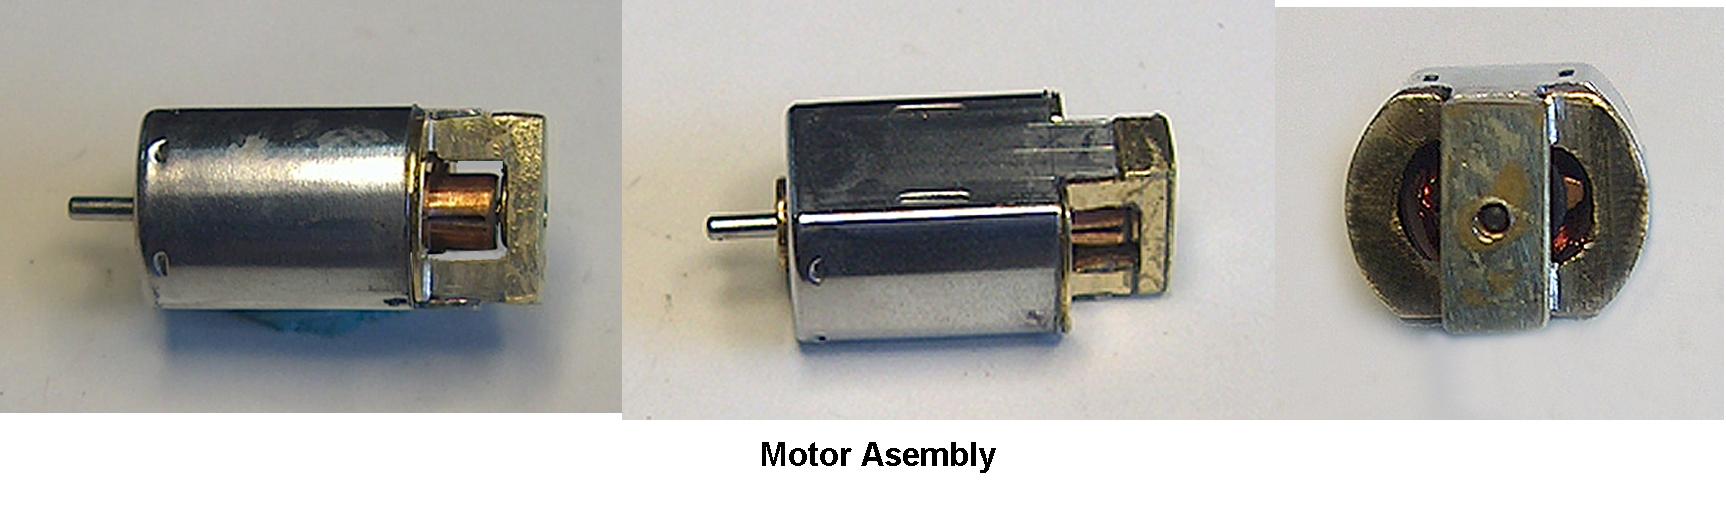 [Motor%20Assembly]